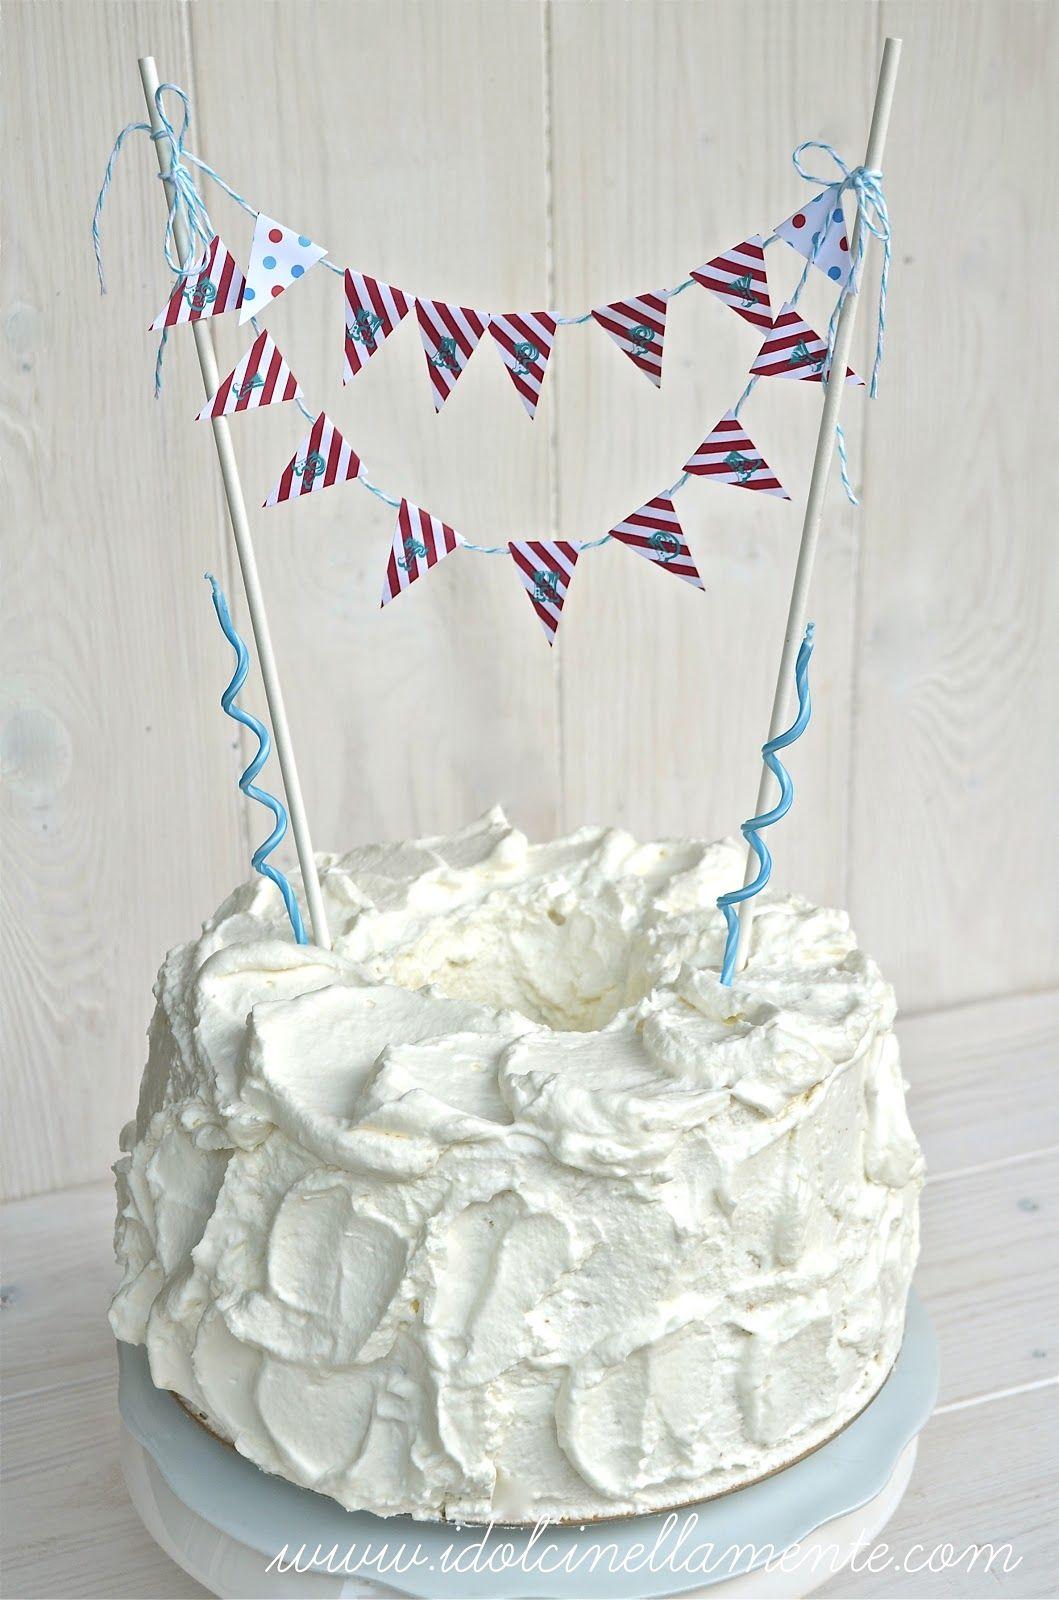 Una torta esagerata…Chiffon cake alla gianduia ricoperta di panna